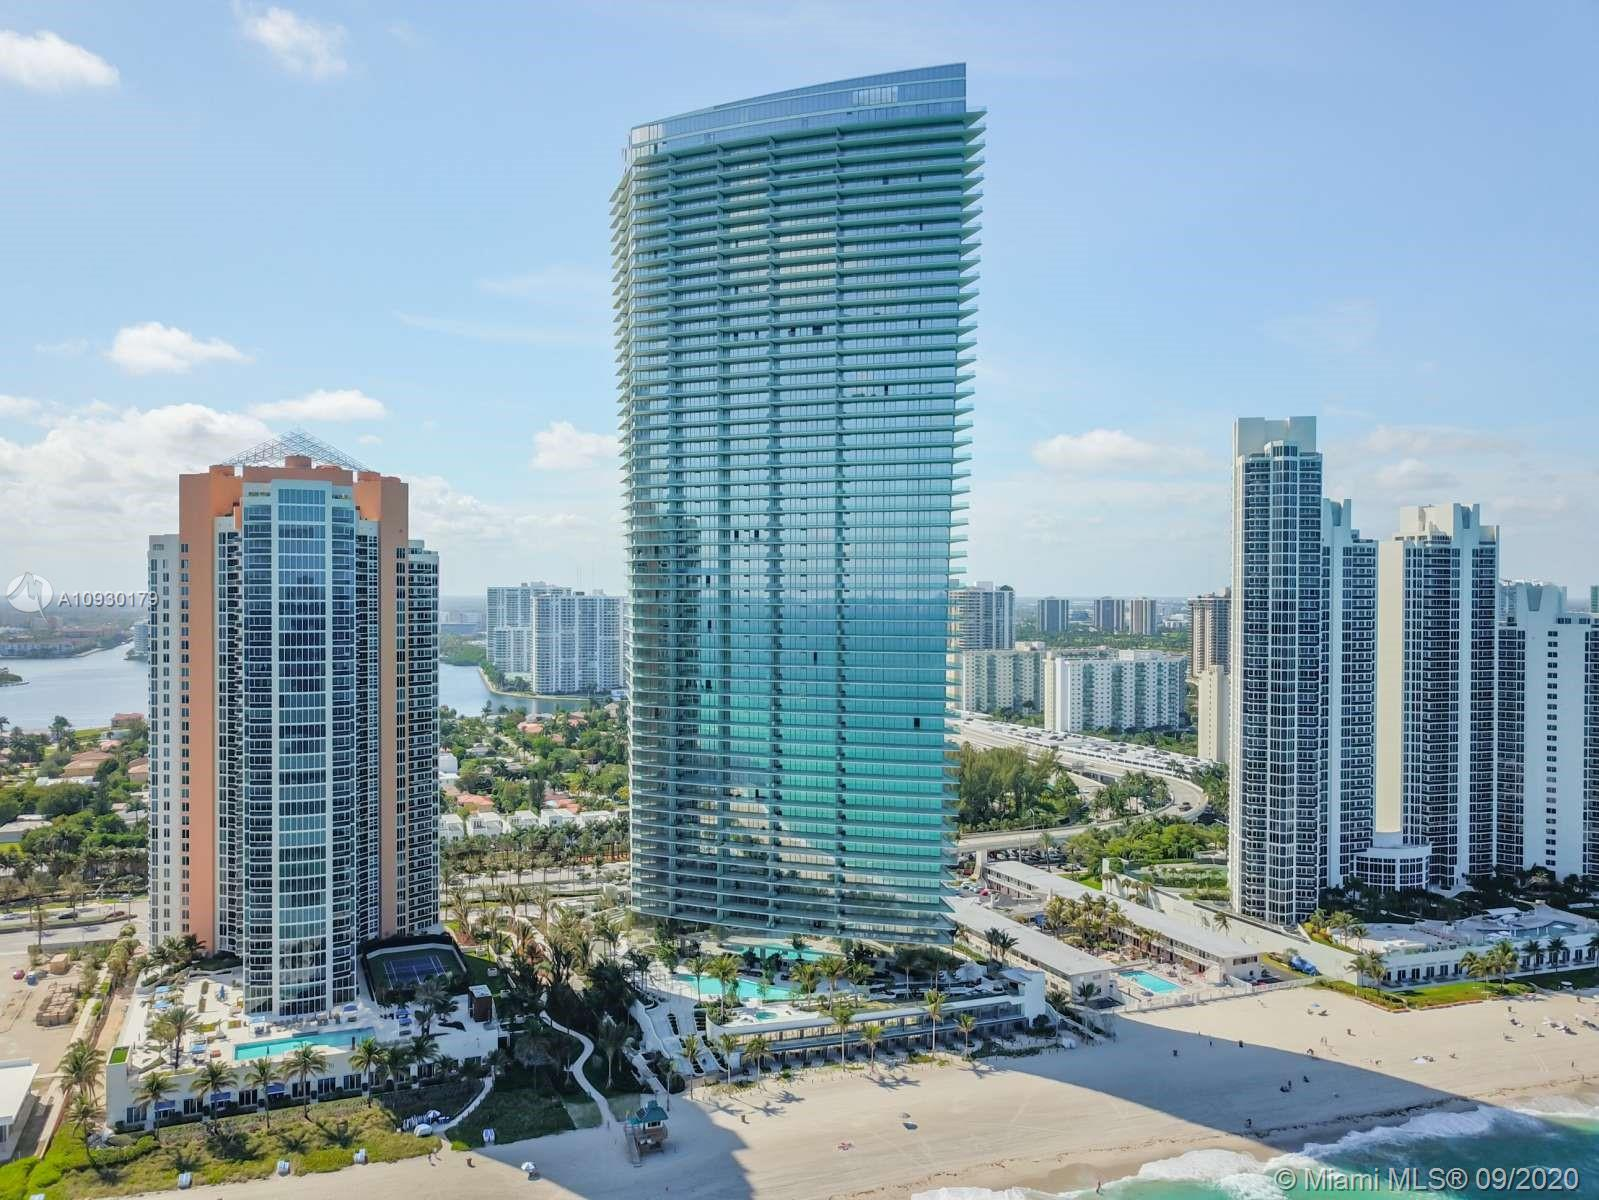 Armani Casa Tower #3105 - 18975 COLLINS #3105, Sunny Isles Beach, FL 33160